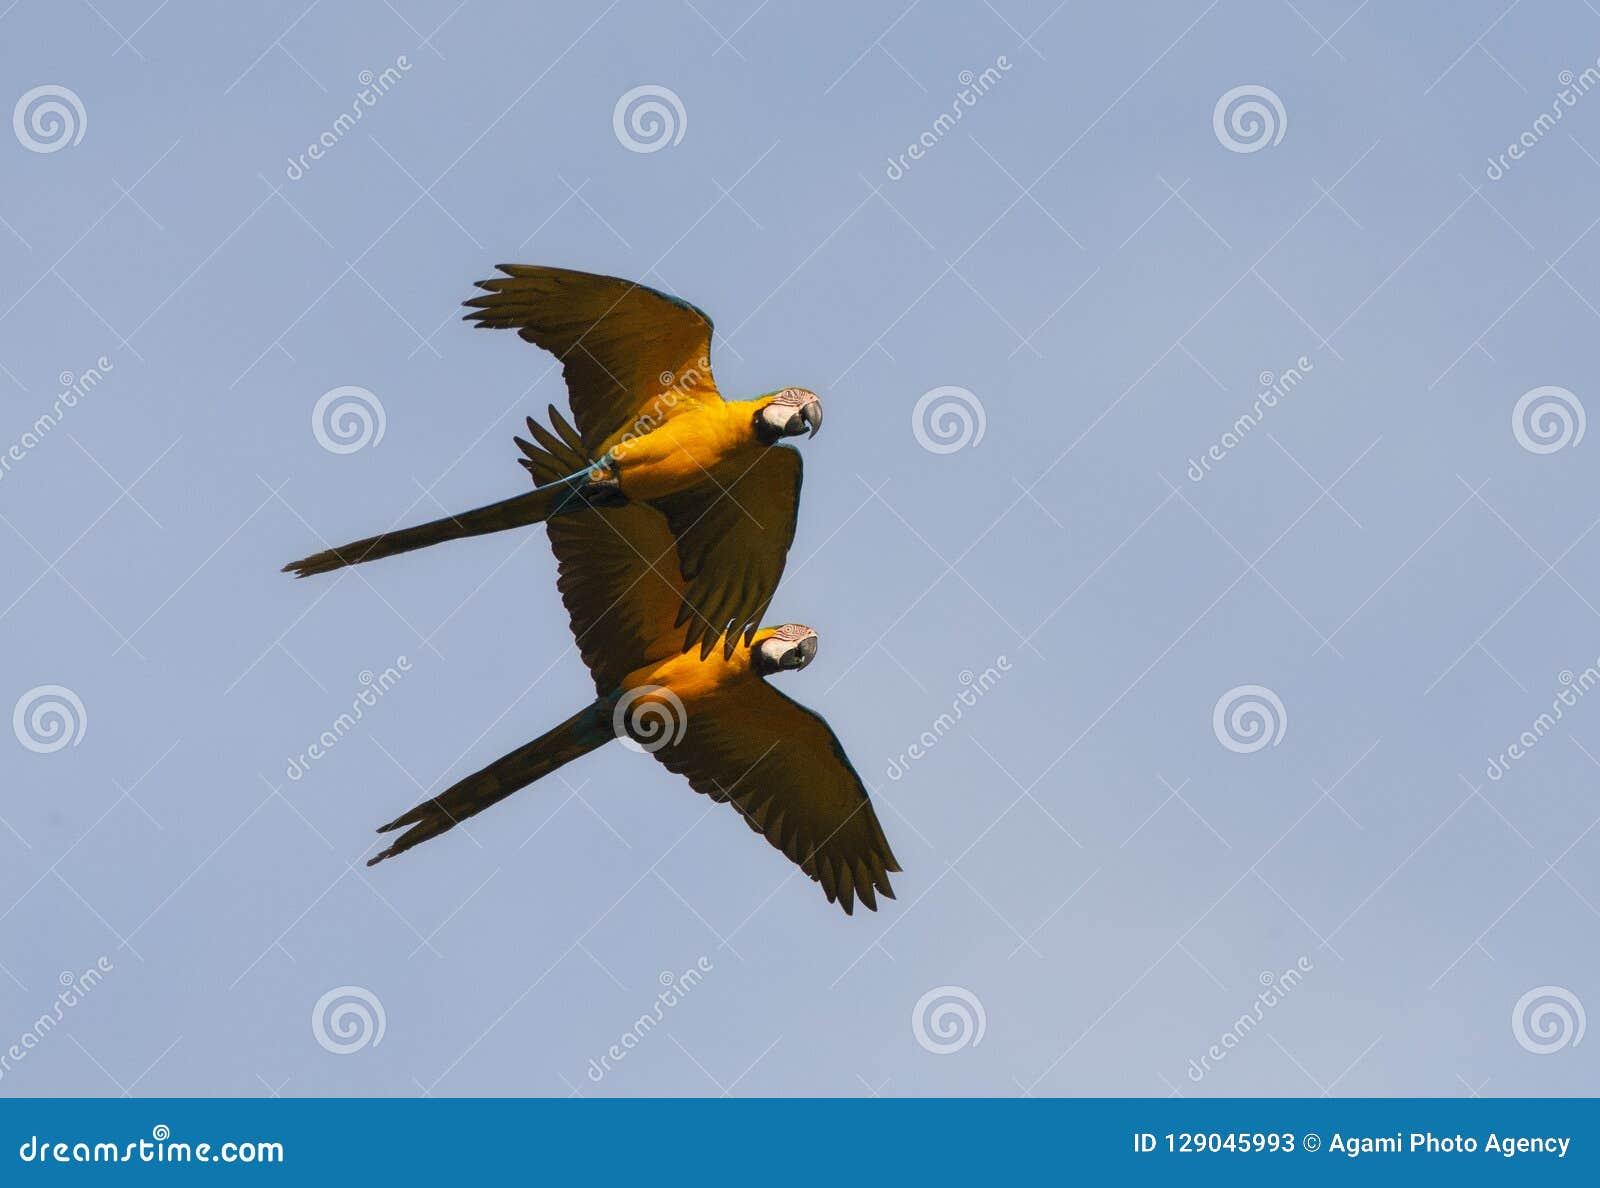 Blauw-gele Ara, Blue-and-yellow Macaw, Ara ararauna